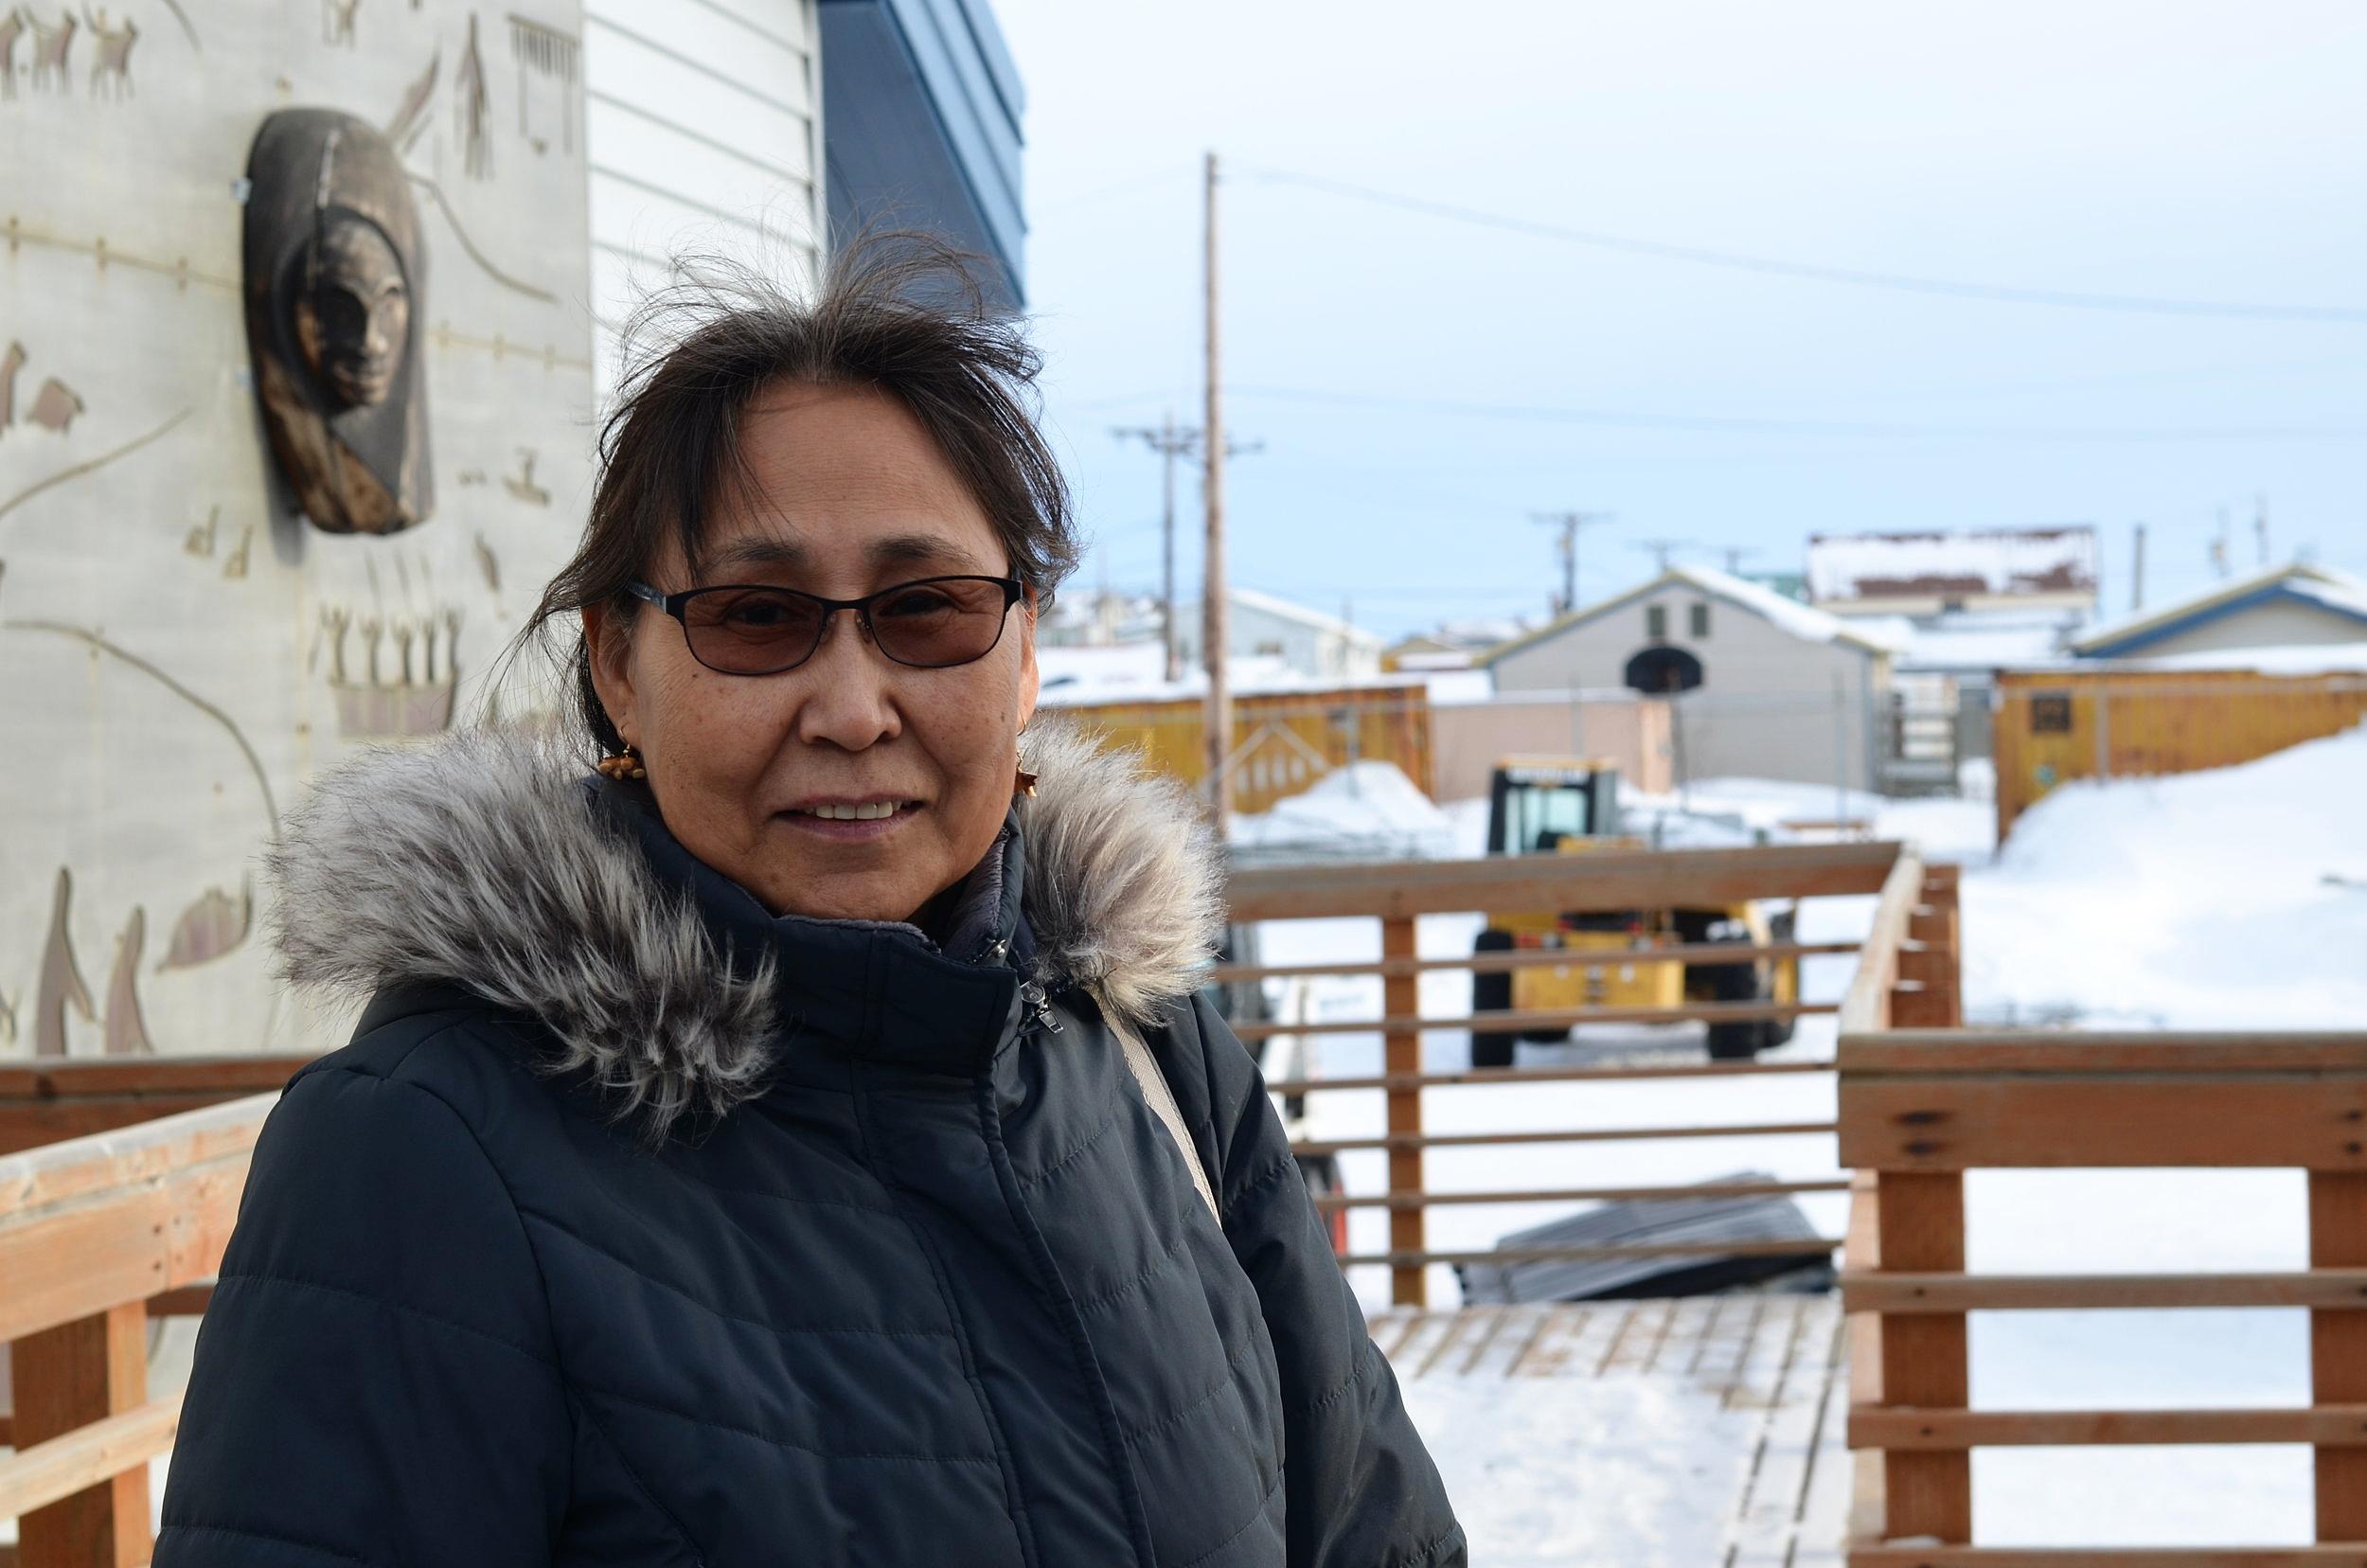 Alvanna-Stimpfle on the boardwalk outside the University of Alaska Northwest Campus in Nome.